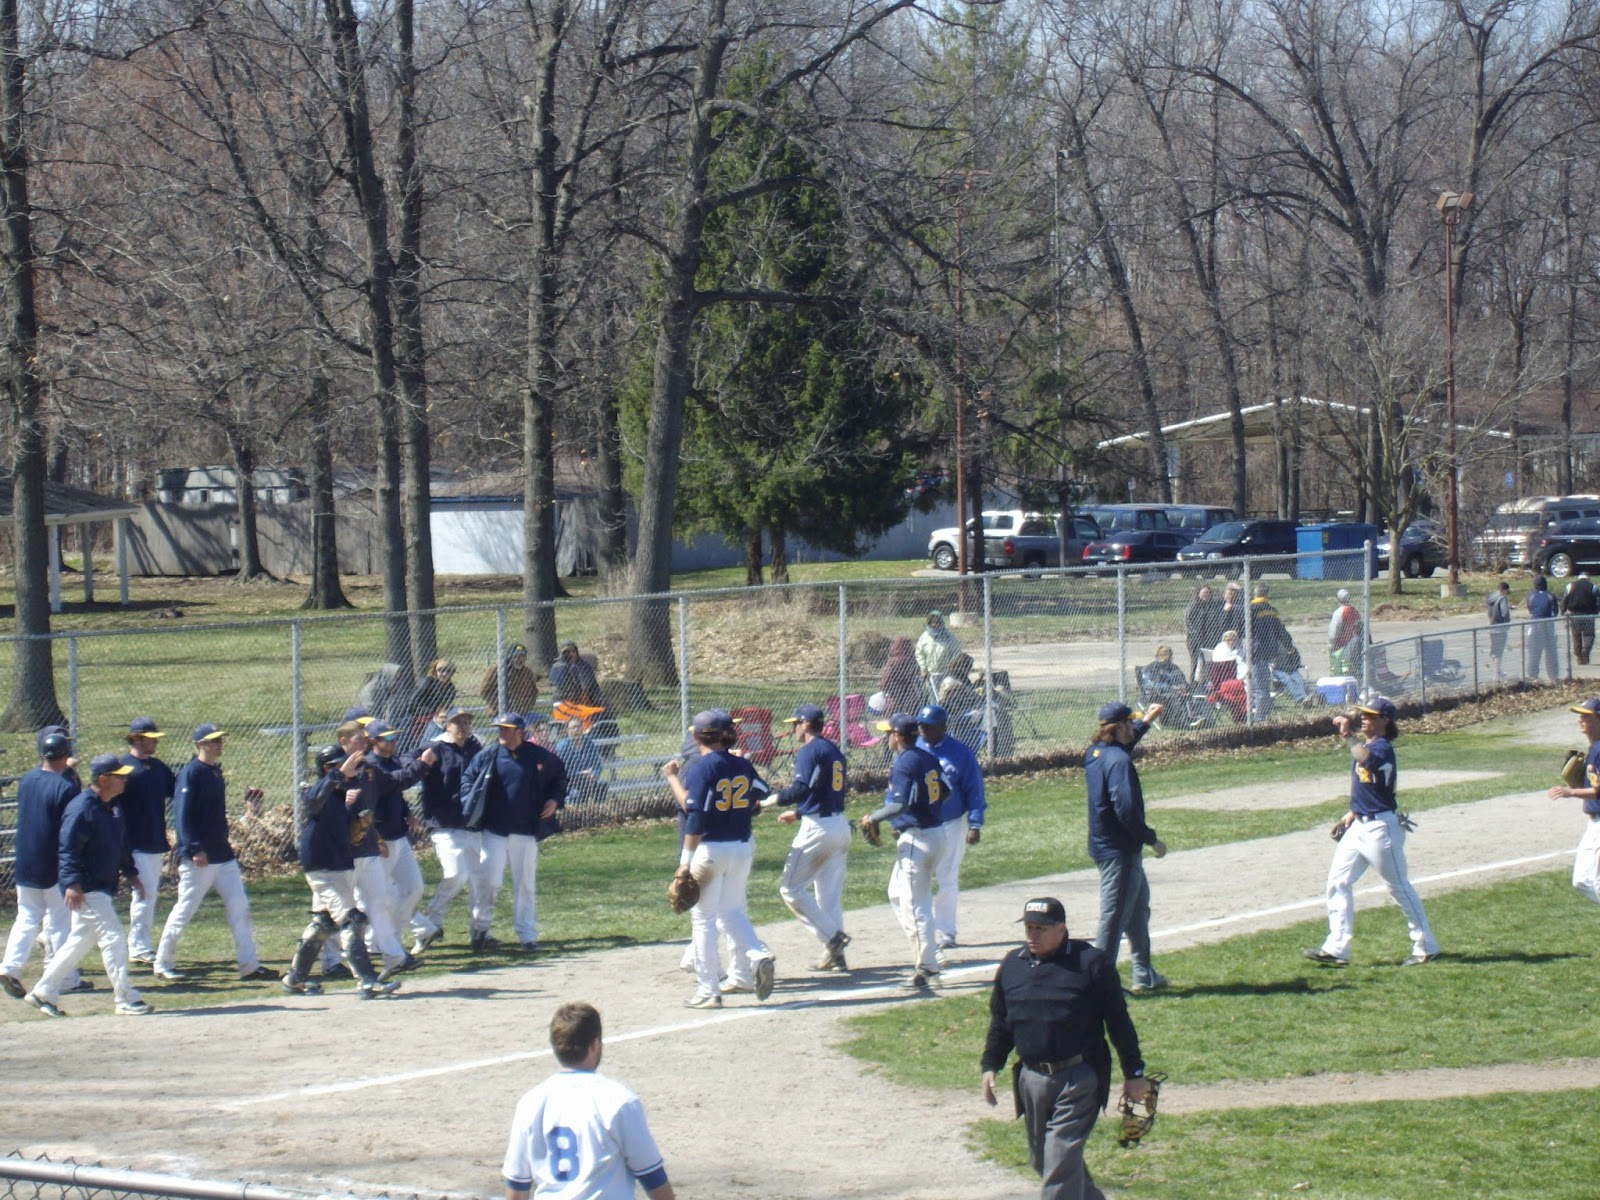 mitten state sports report: college baseball hfcc vs. grcc